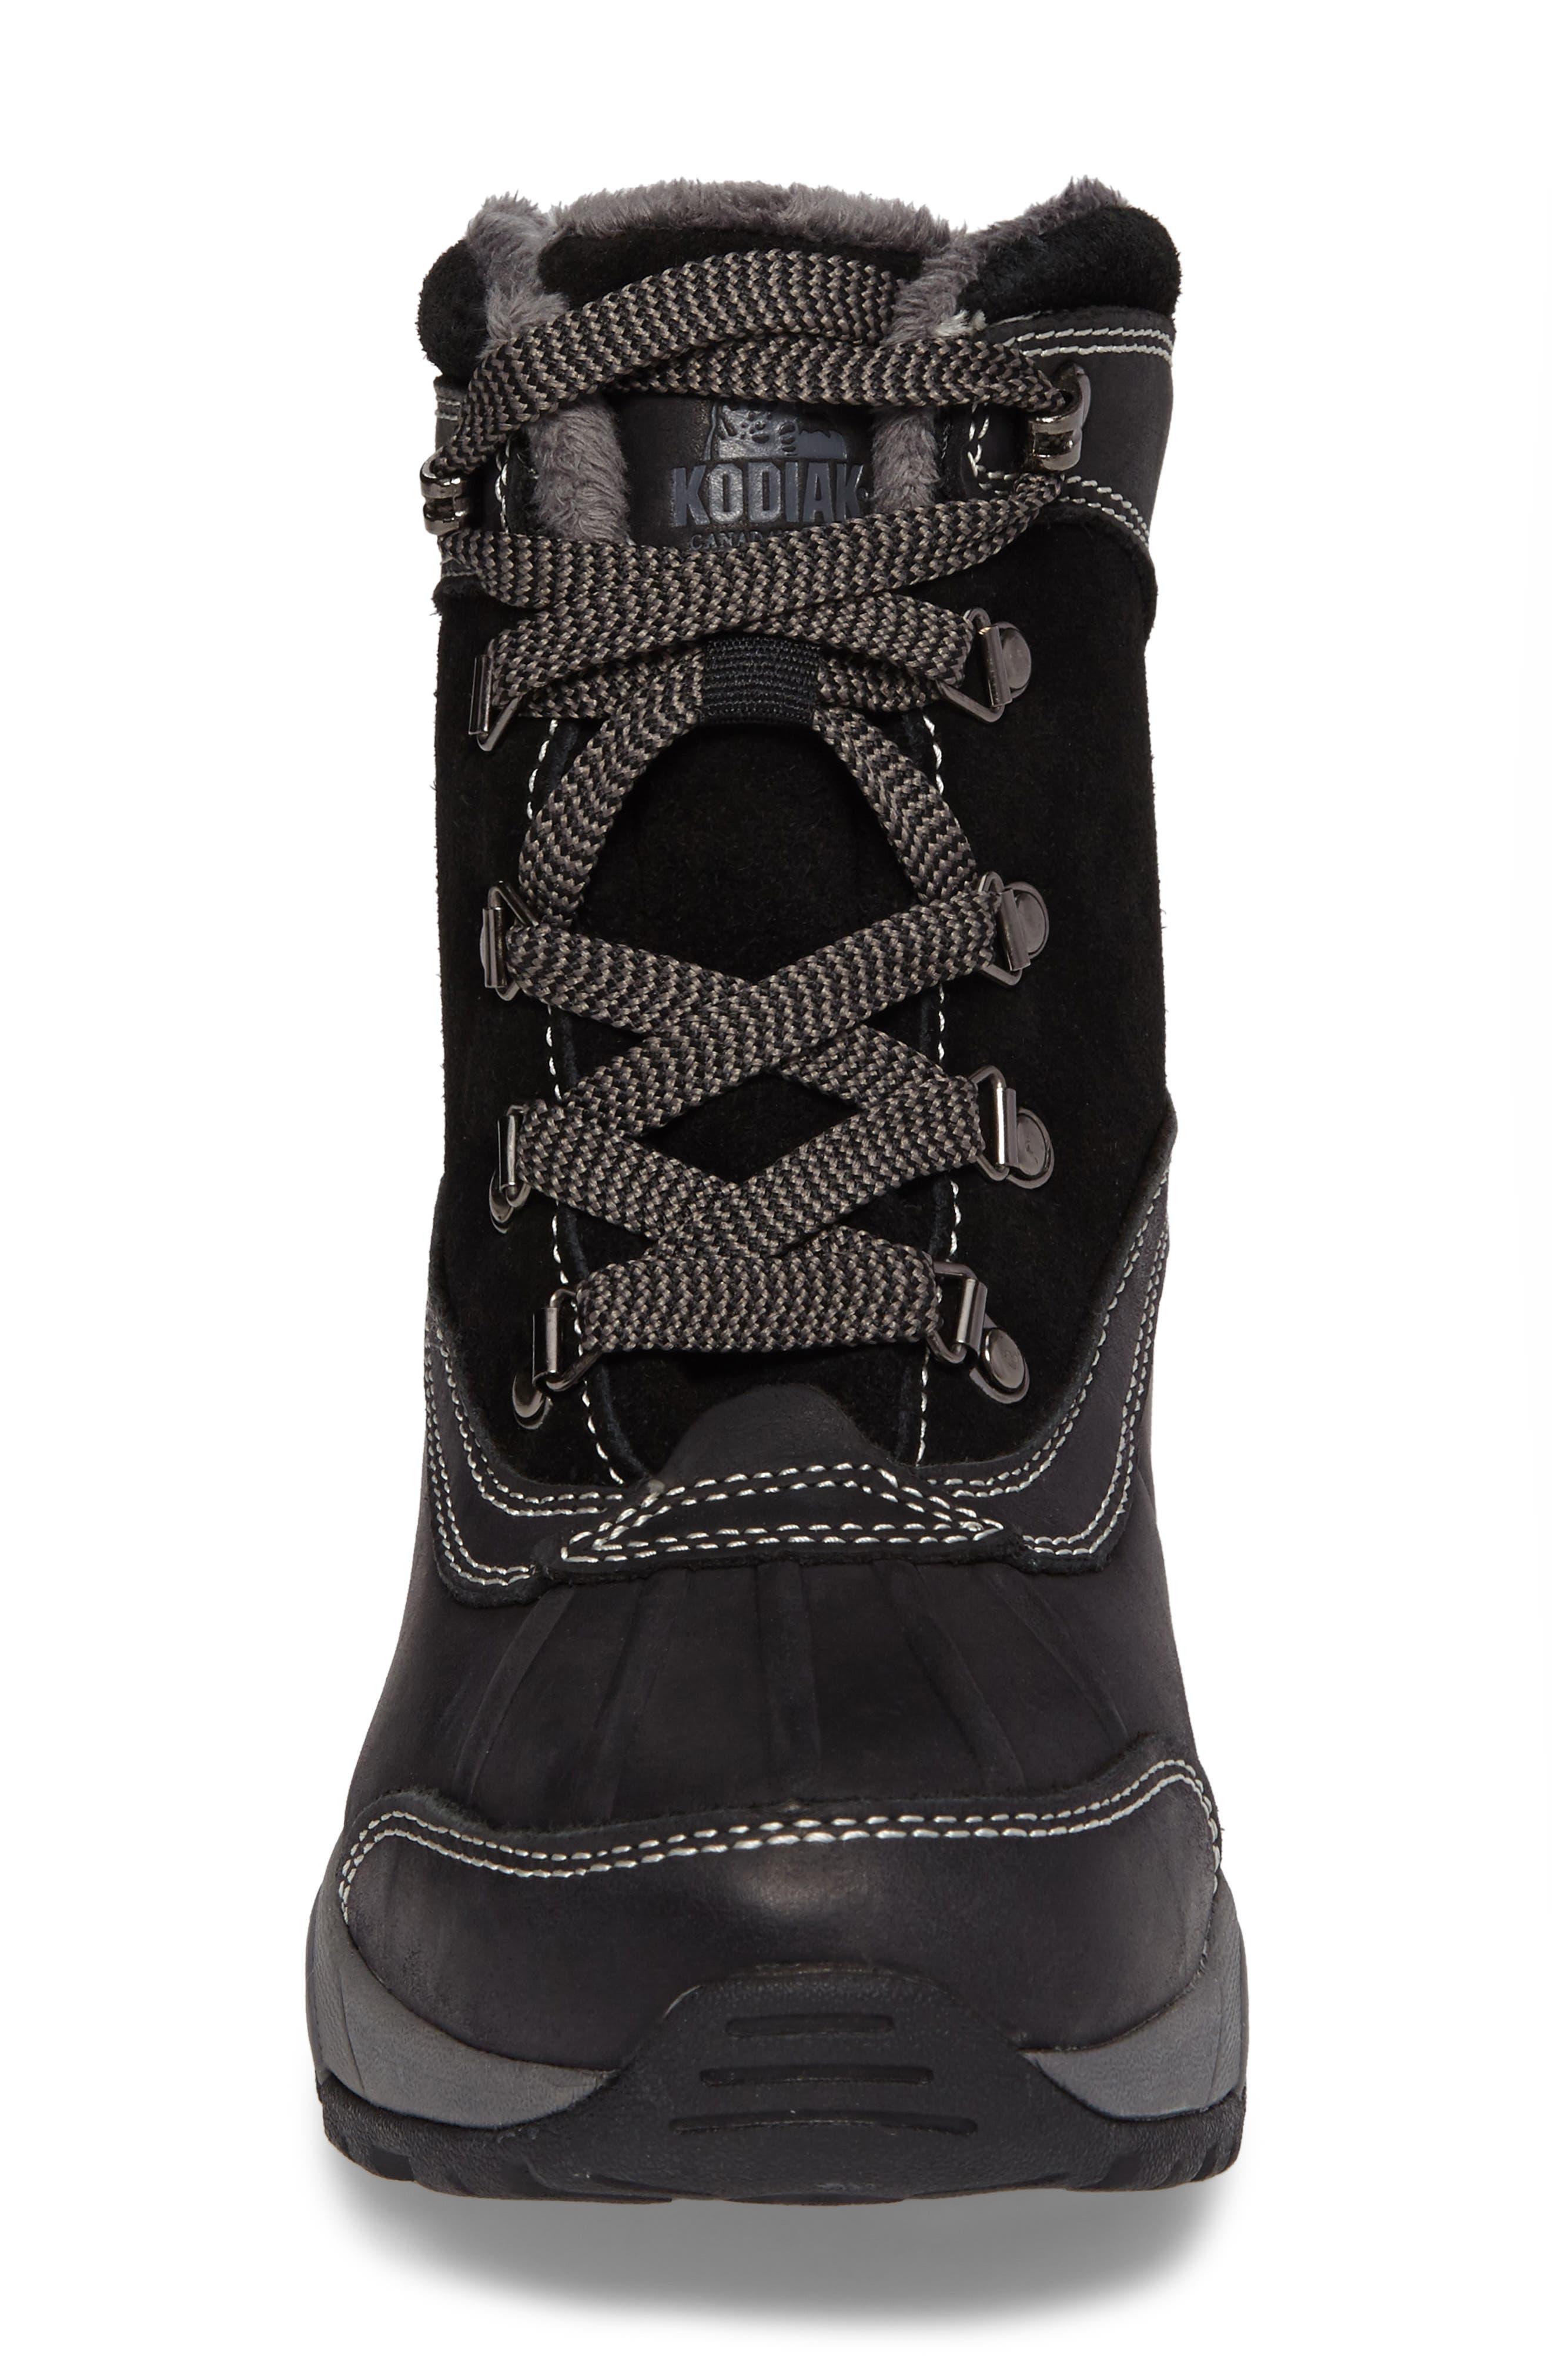 'Renee' Waterproof Insulated Winter Boot,                             Alternate thumbnail 4, color,                             001